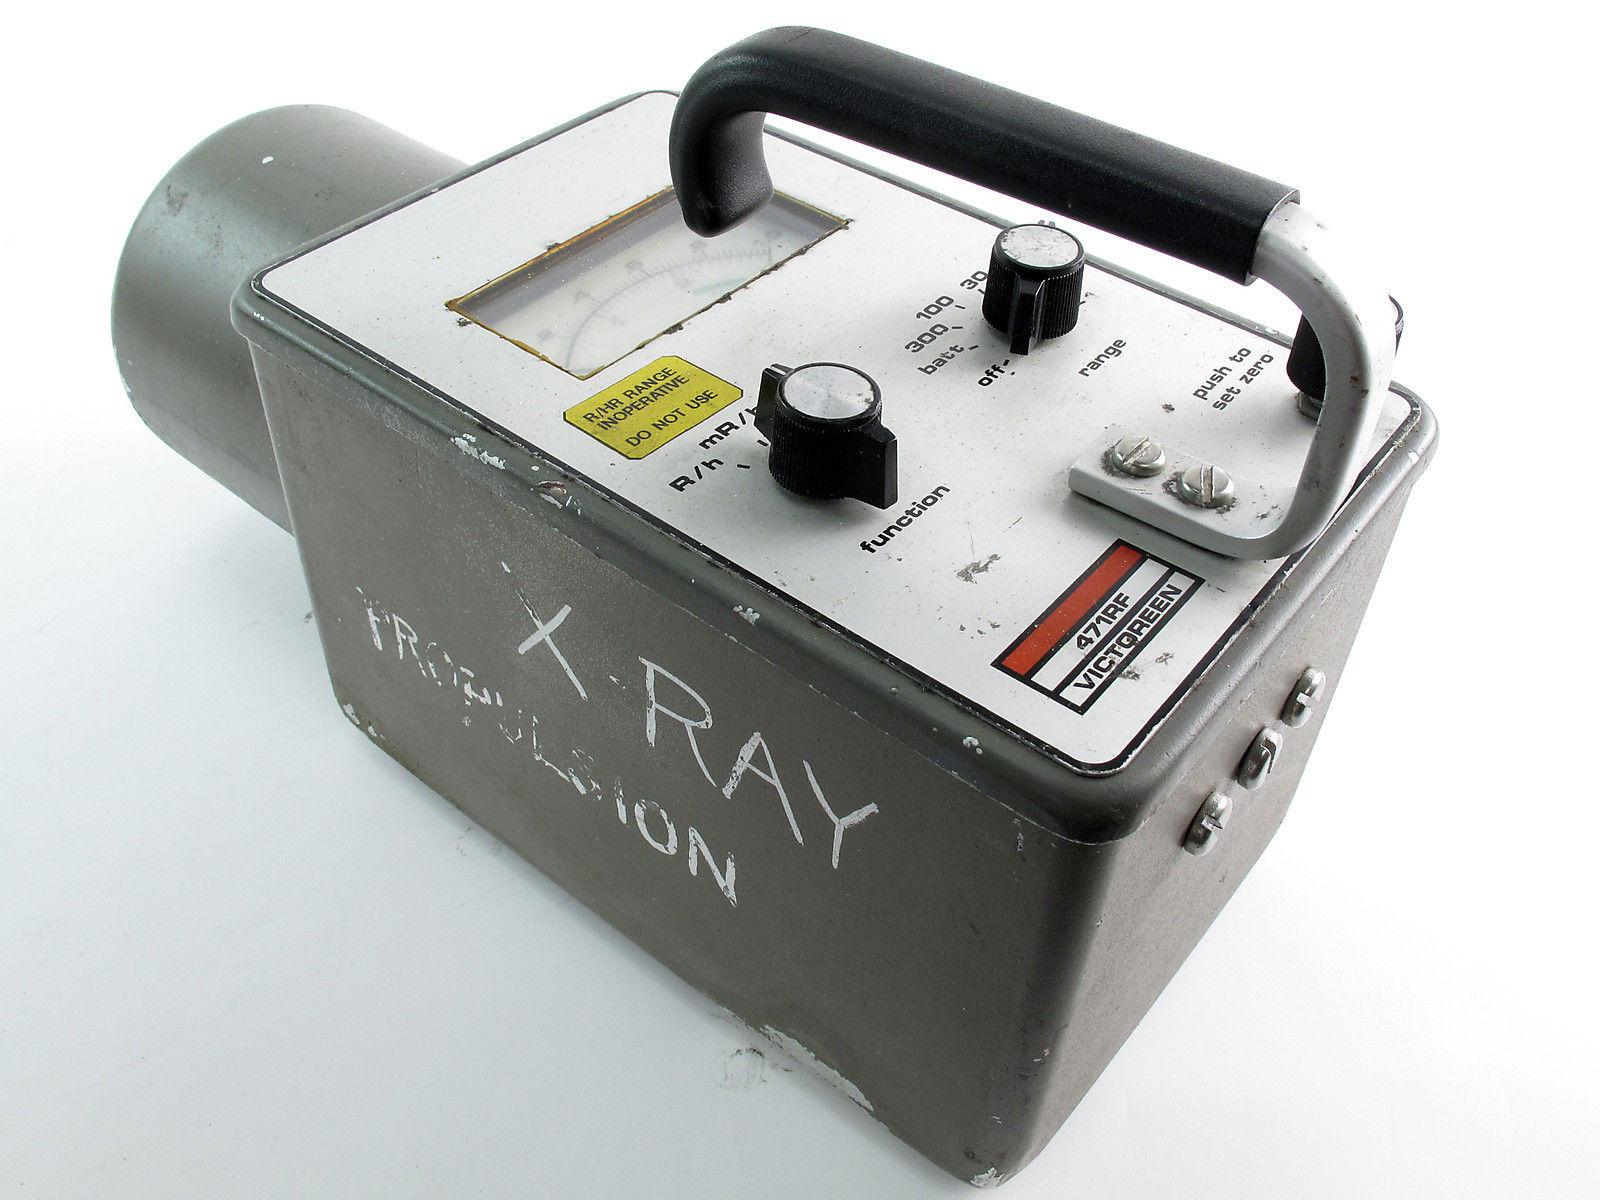 Victoreen X-Ray